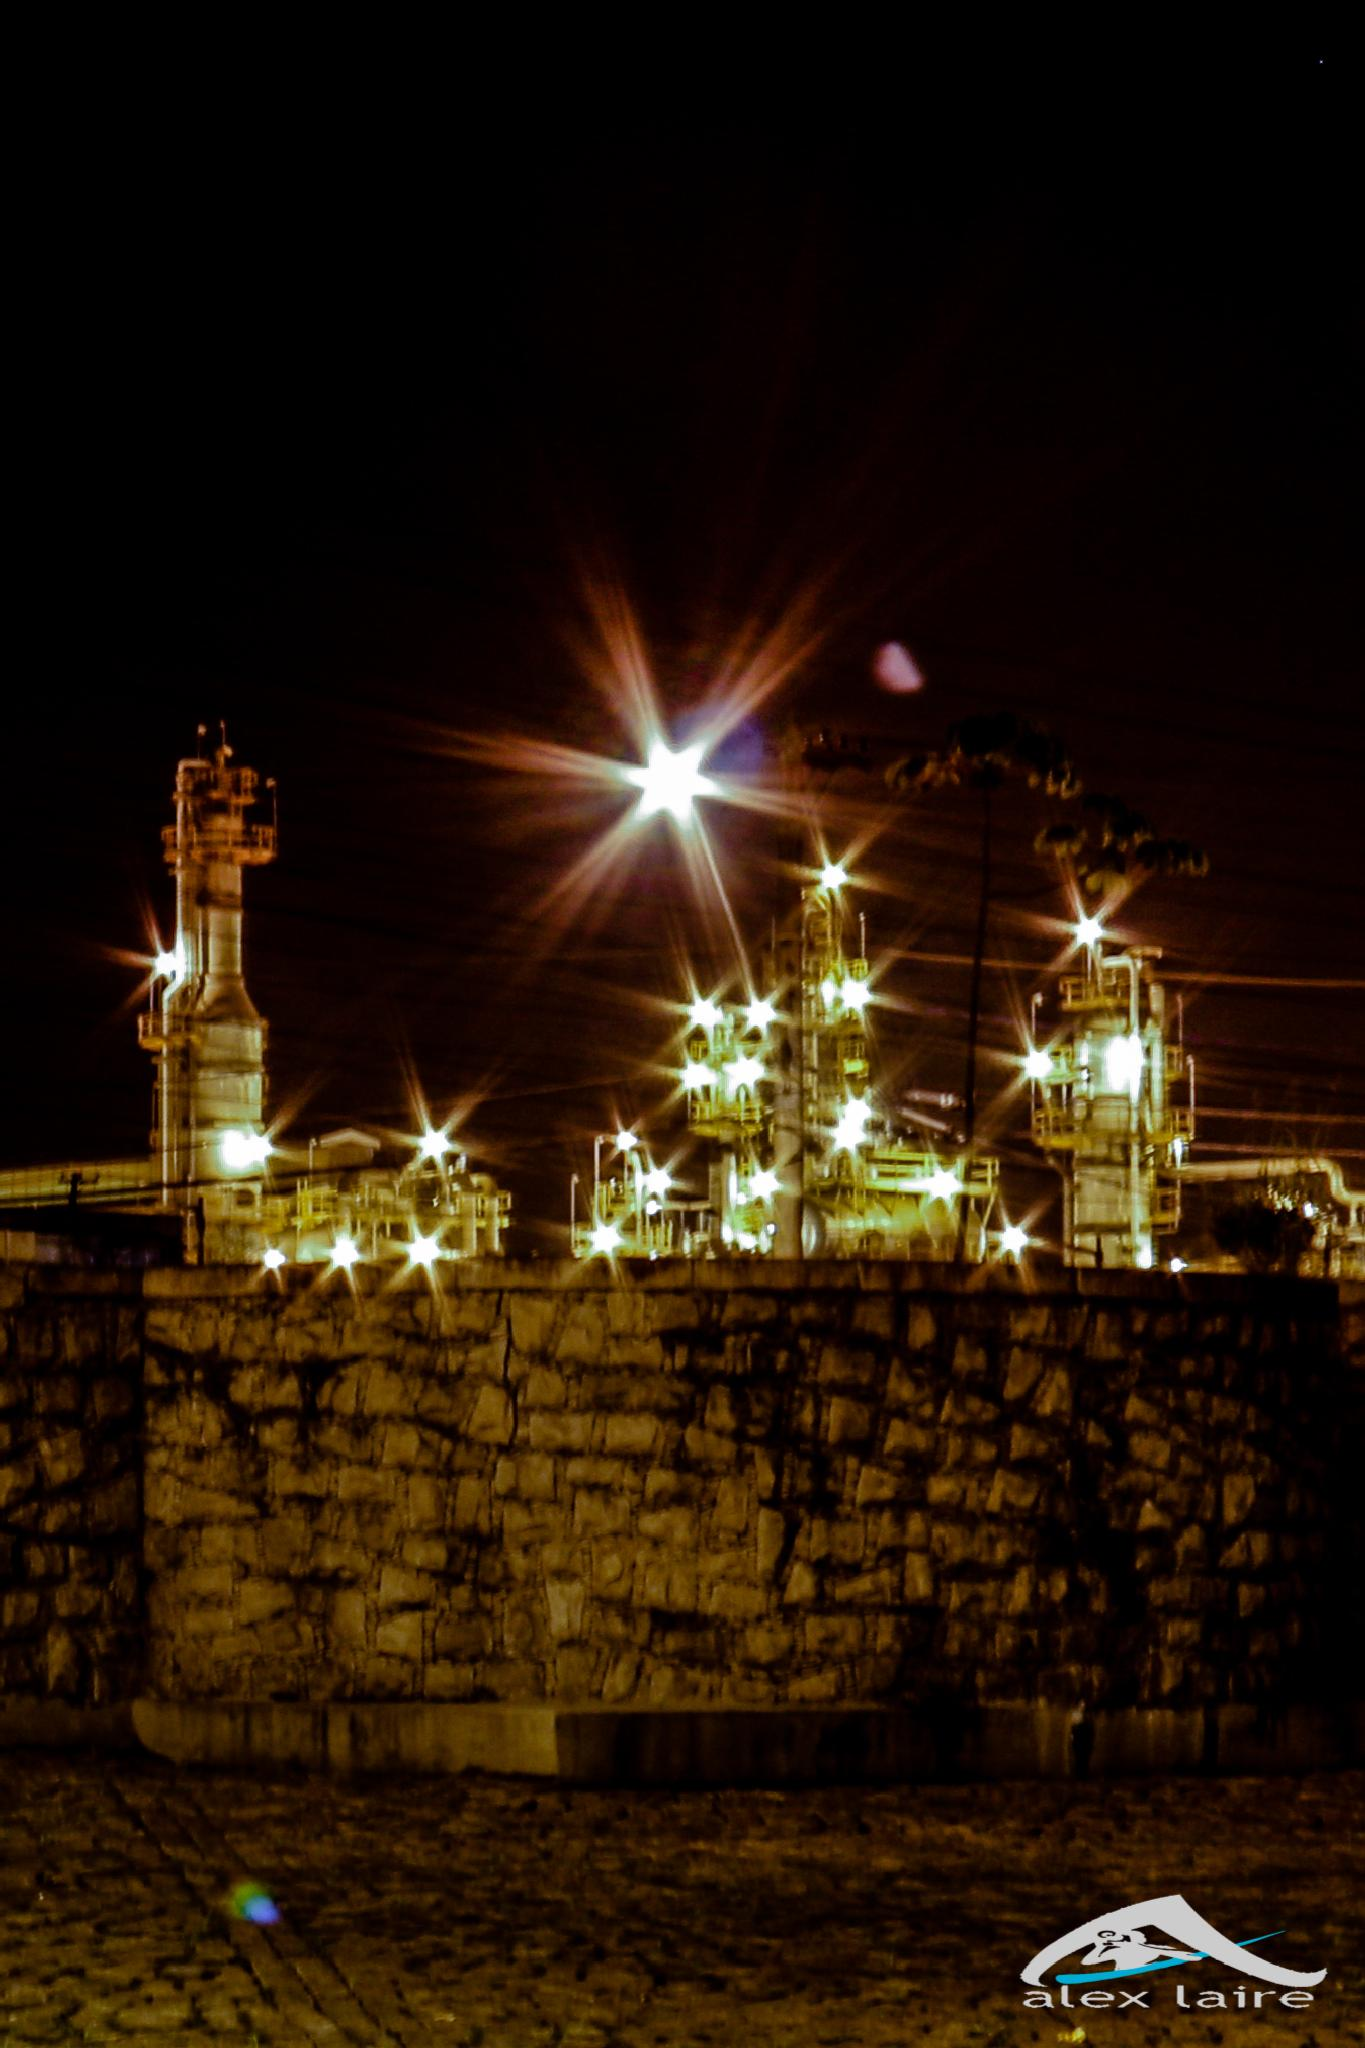 Parque Industrial. by alex.laire